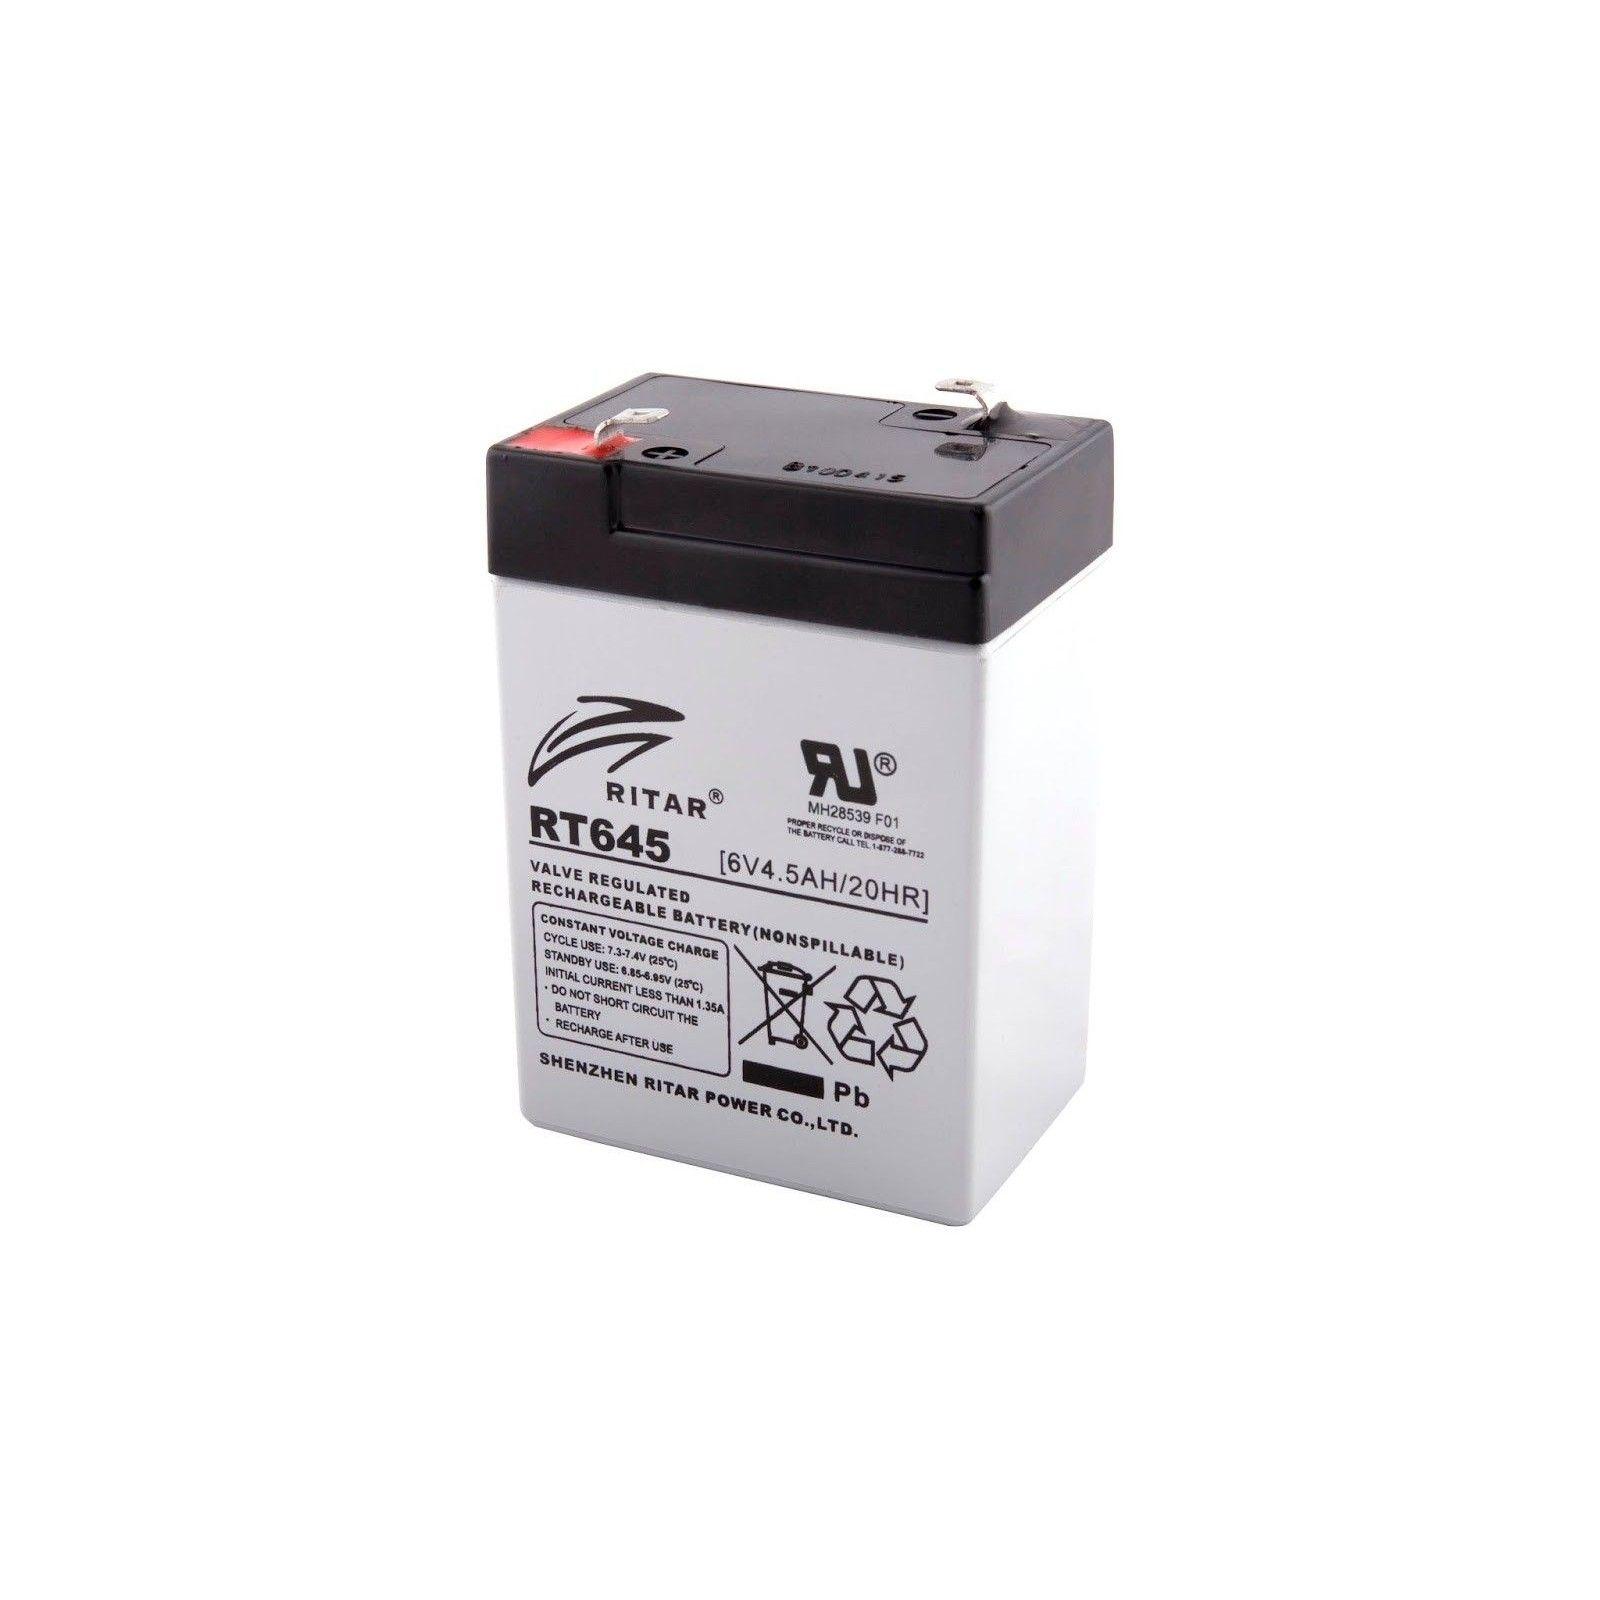 BATTERY MK POWERED AGM ES1.9-12 12V 2,3AH  - 1